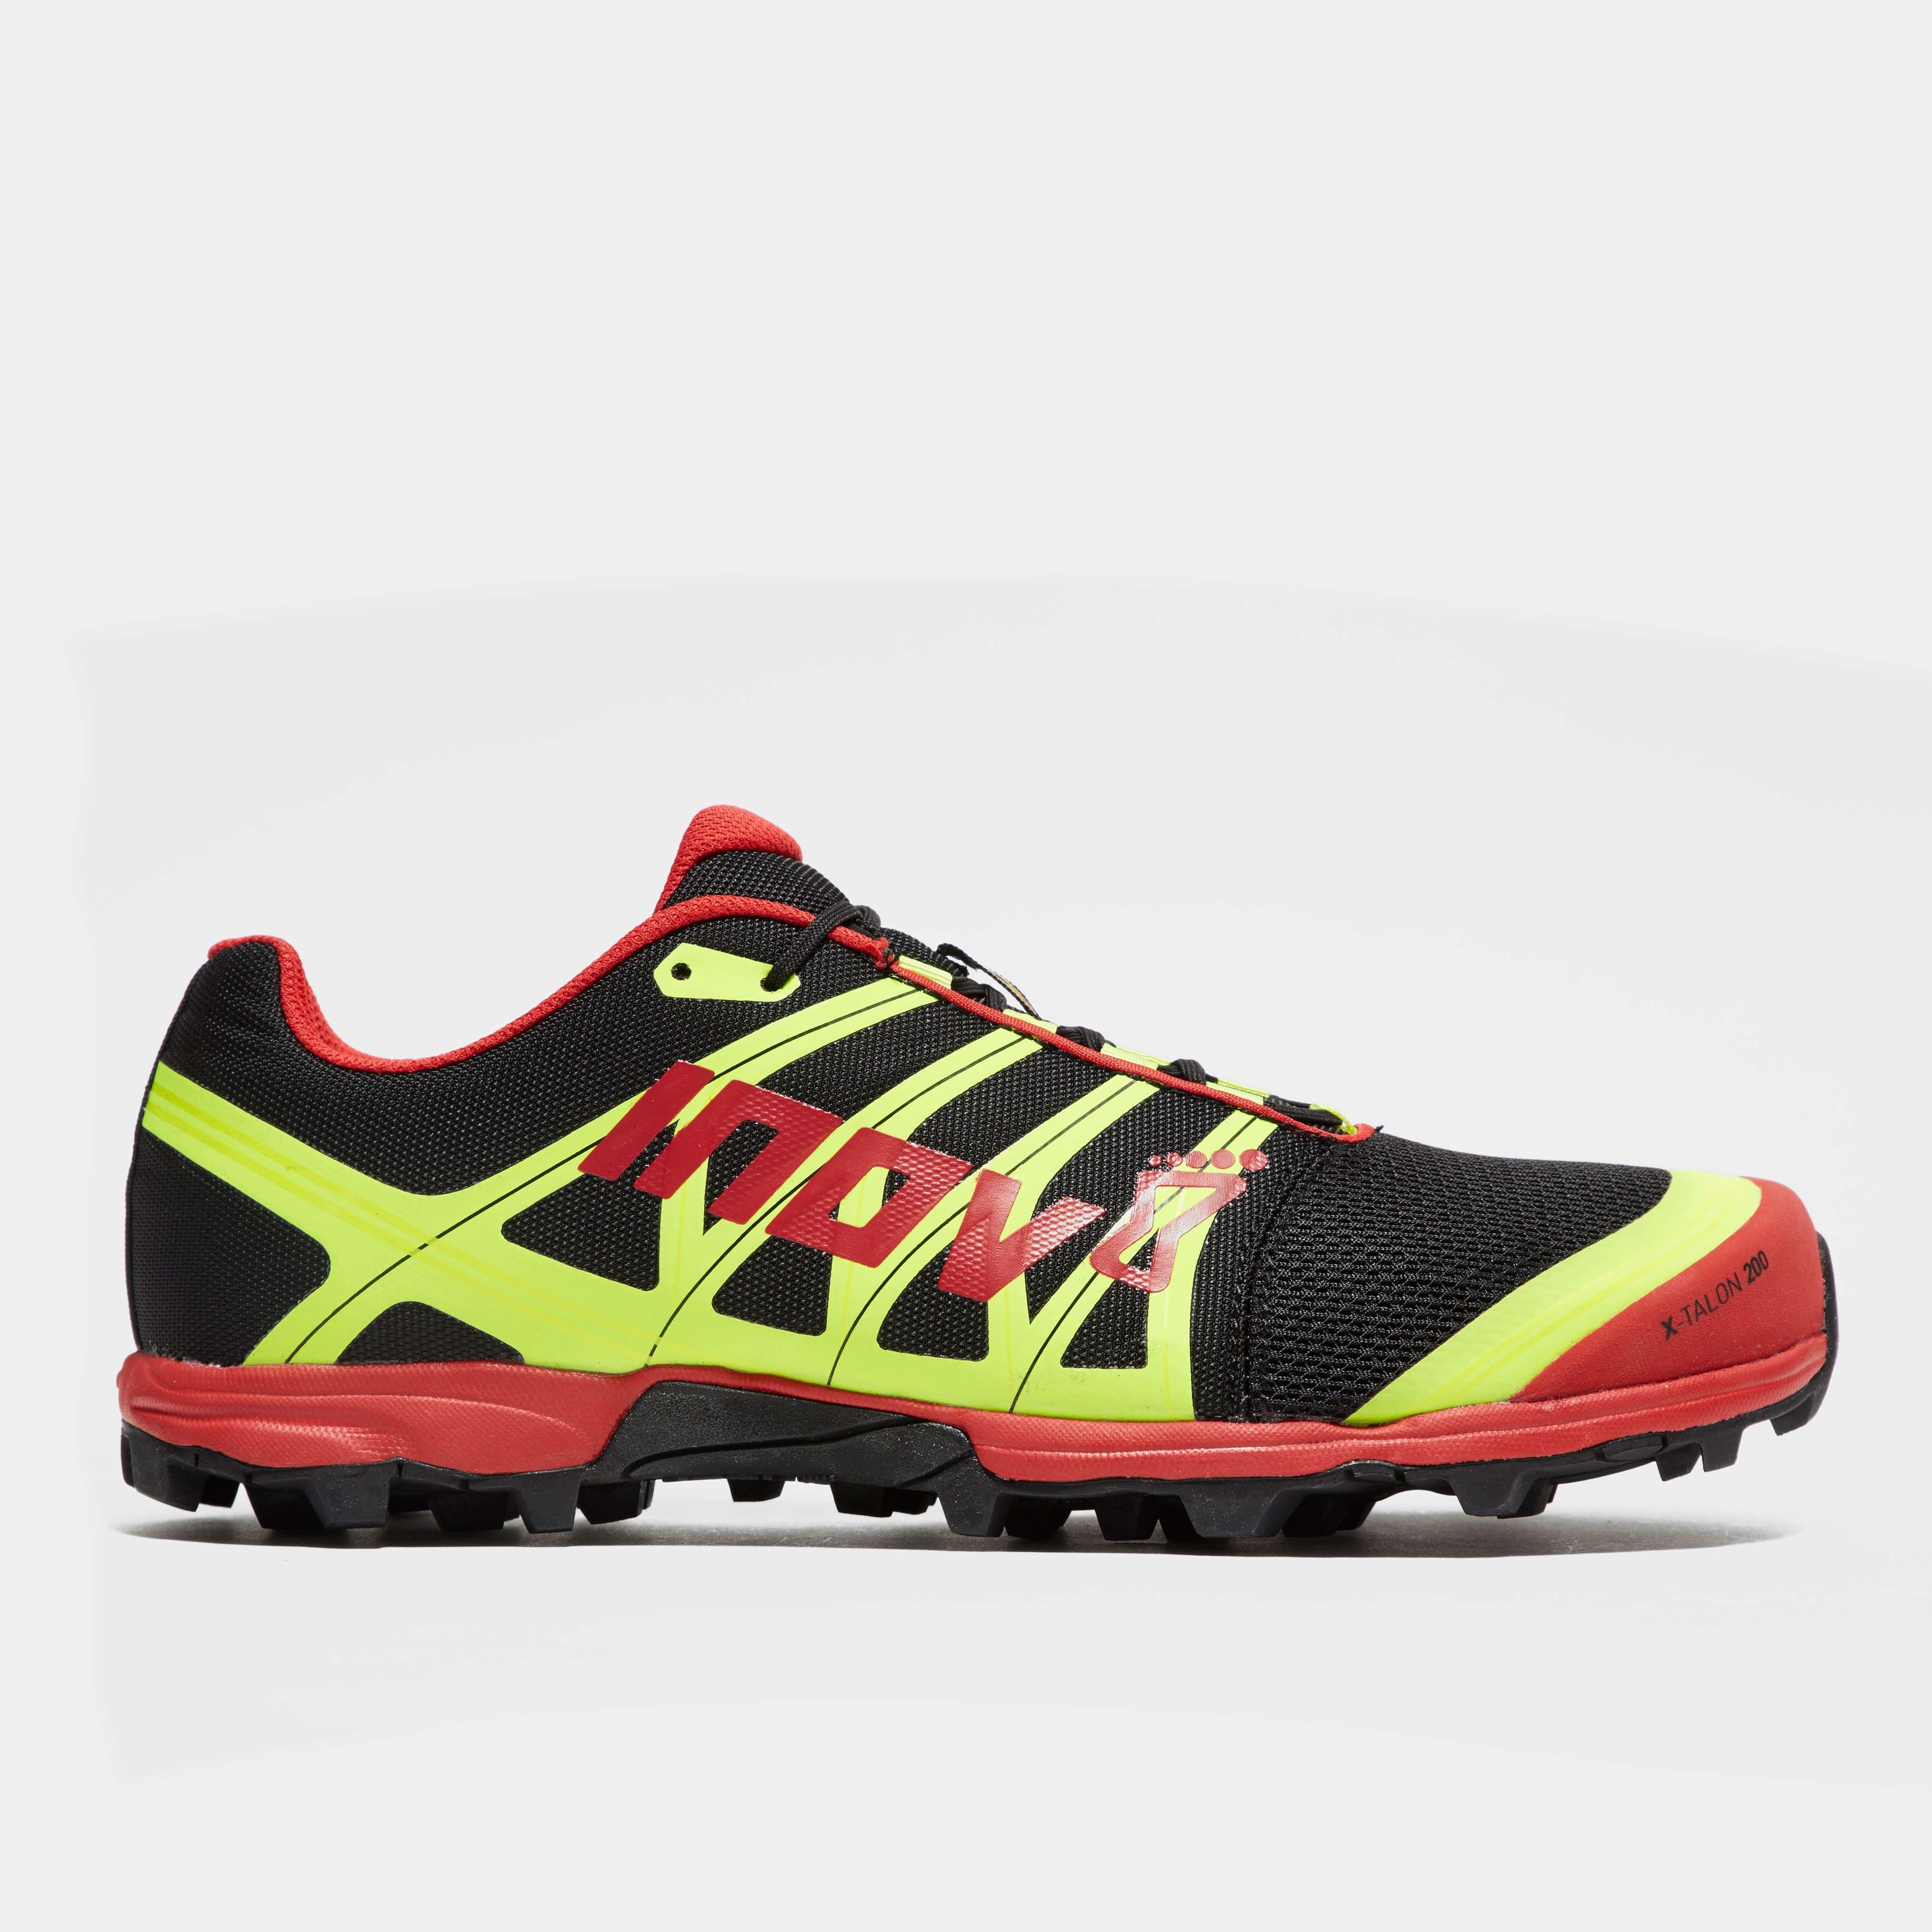 INOV-8 Men's X-Talon 200 Trail Running Shoes